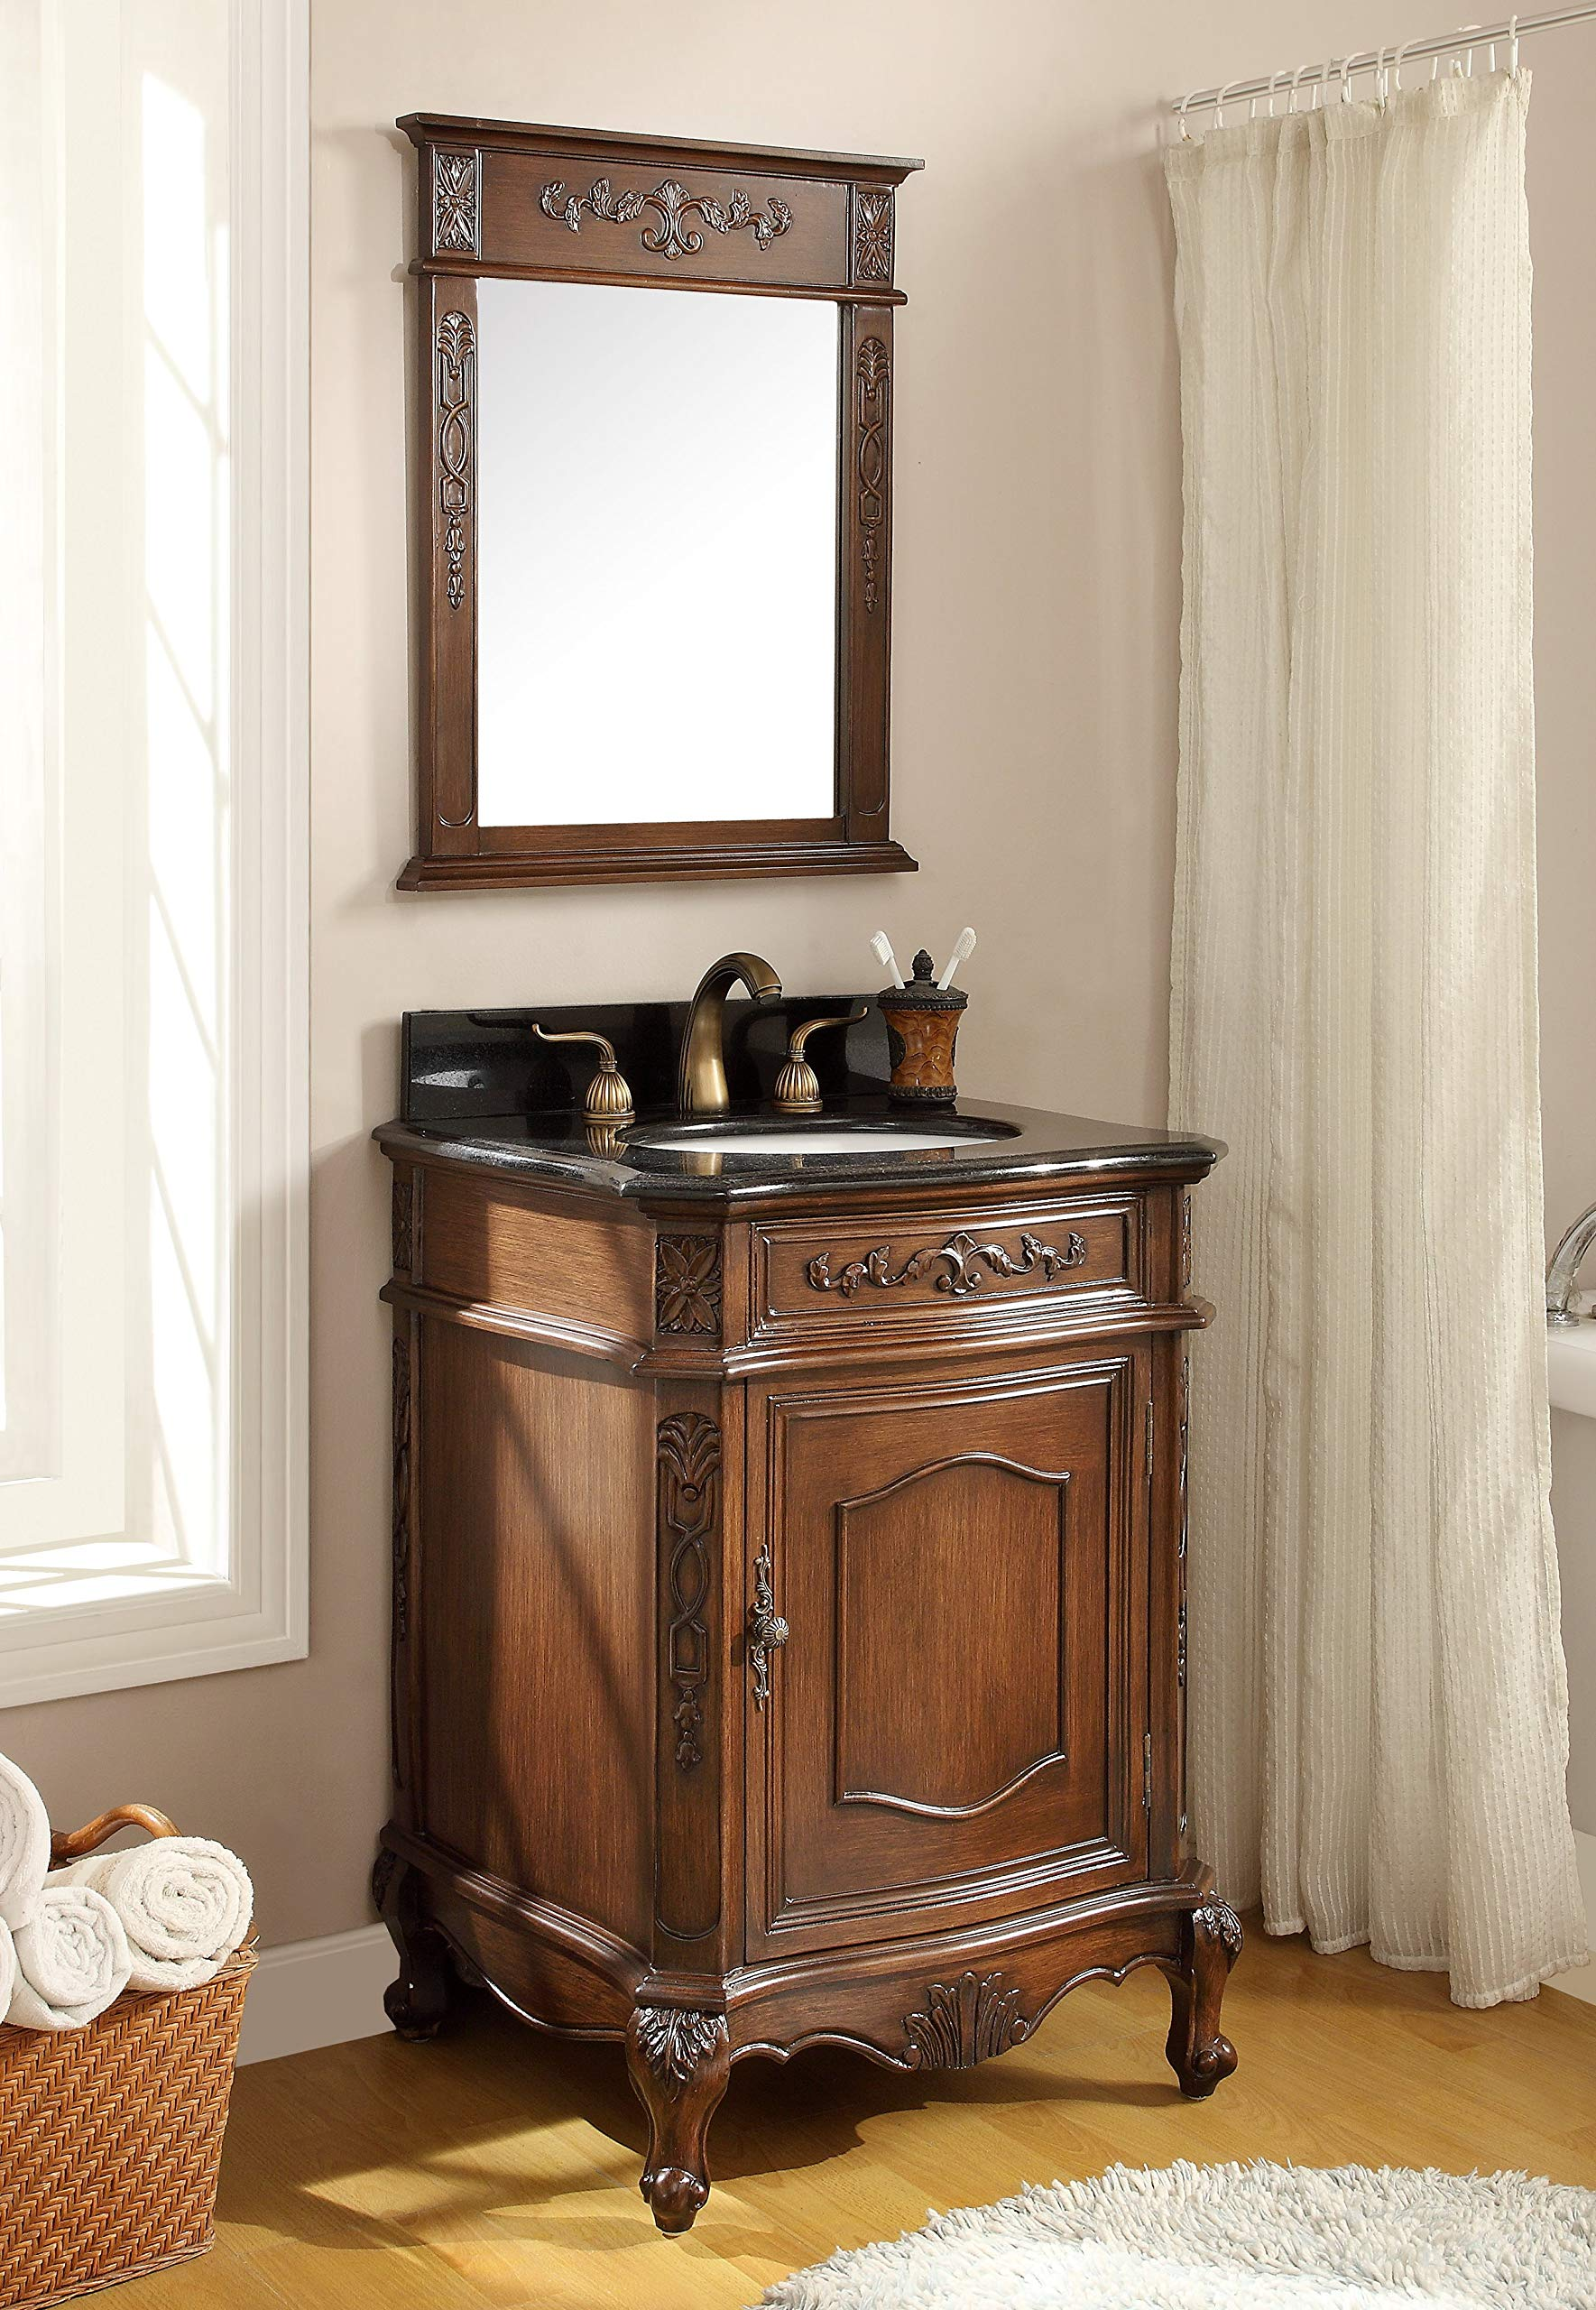 24 Powder Room Special Debellis Bathroom Sink Vanity W Matching Mirror Bwv 047gt Mir Buy Online In Montenegro At Montenegro Desertcart Com Productid 198693931